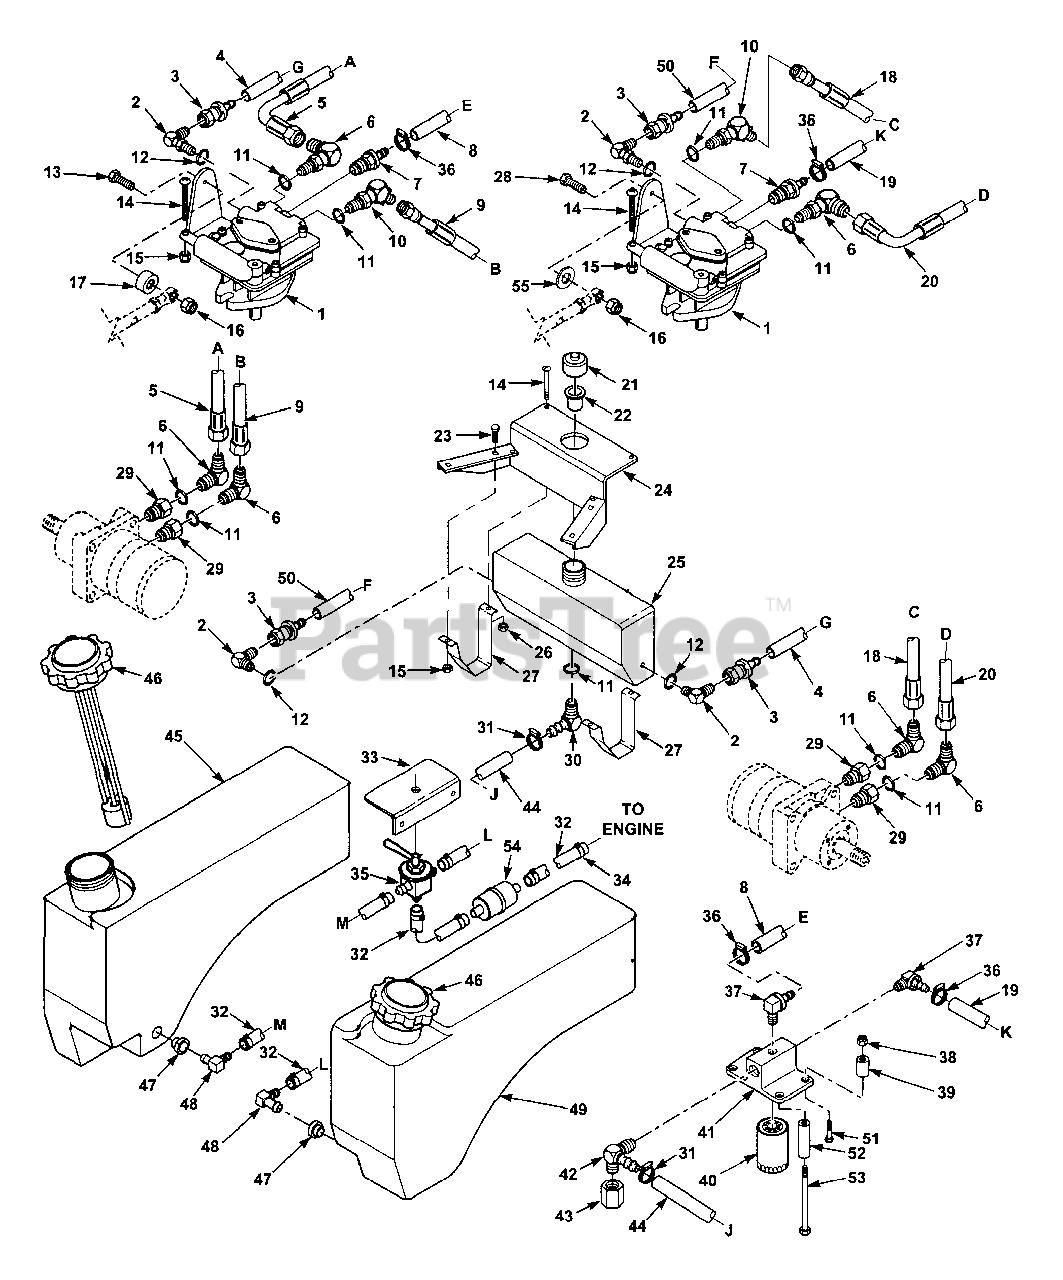 Scag Stc48a 19ka Scag Tiger Cub 48 Zero Turn Mower 19hp Kawasaki Sn 5880000 5889999 Fuel And Hydraulic System Parts Lookup With Diagrams Partstree